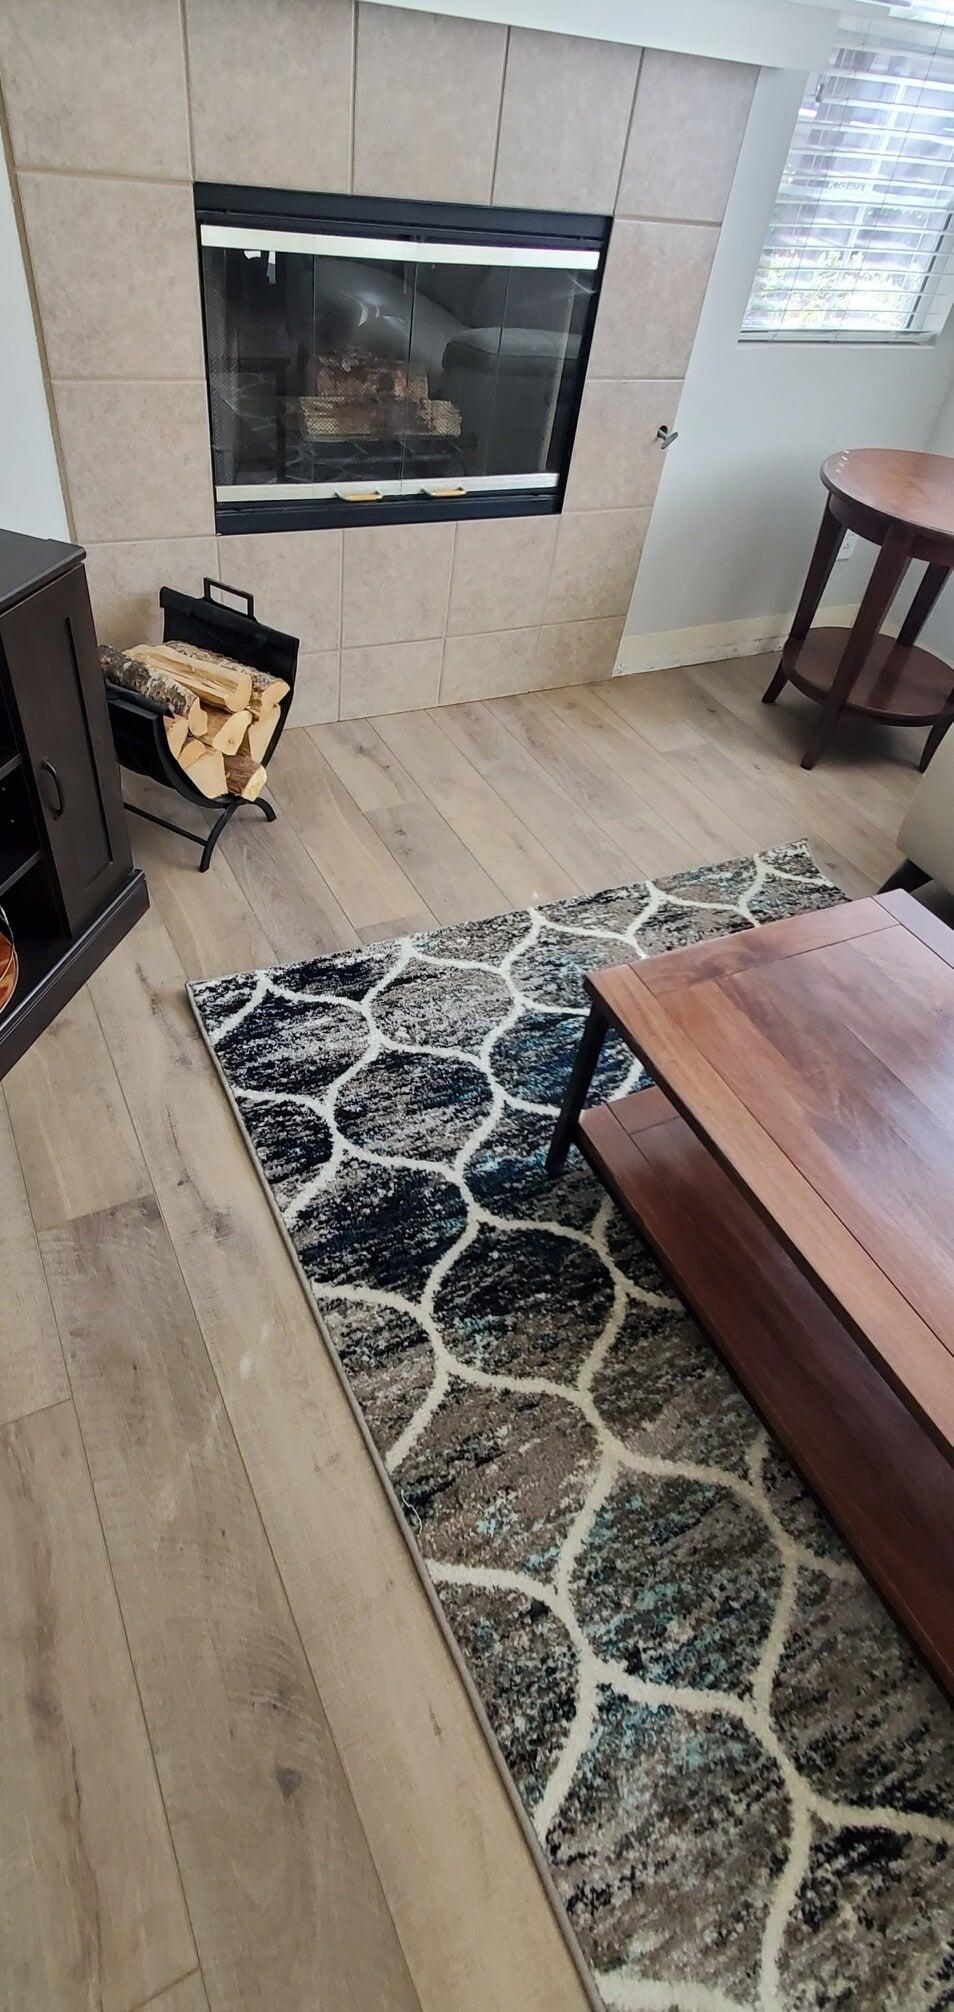 Wood flooring in Wildomar, CA from Hardwood Floors Outlet